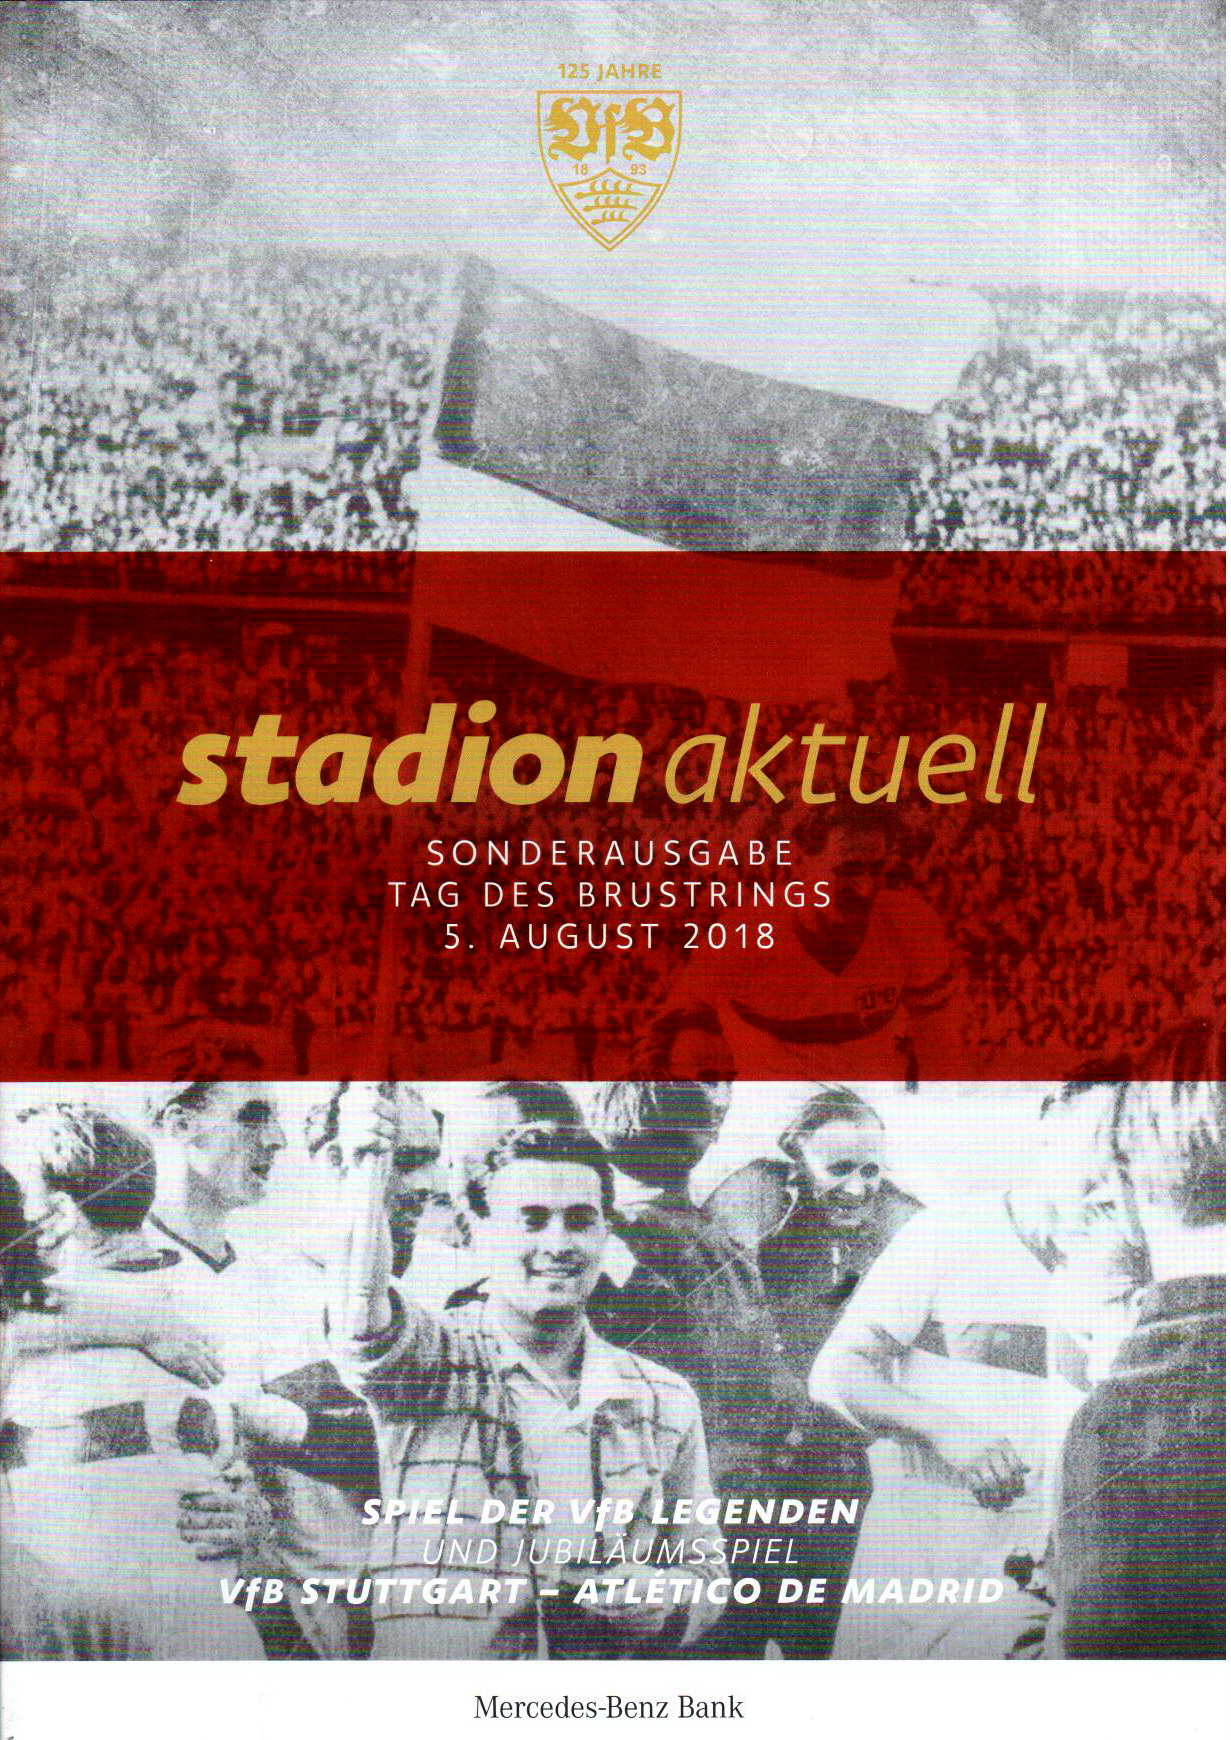 Vfb Stuttgart 1893 Vs Atlético Madrid Wwwsoke2de